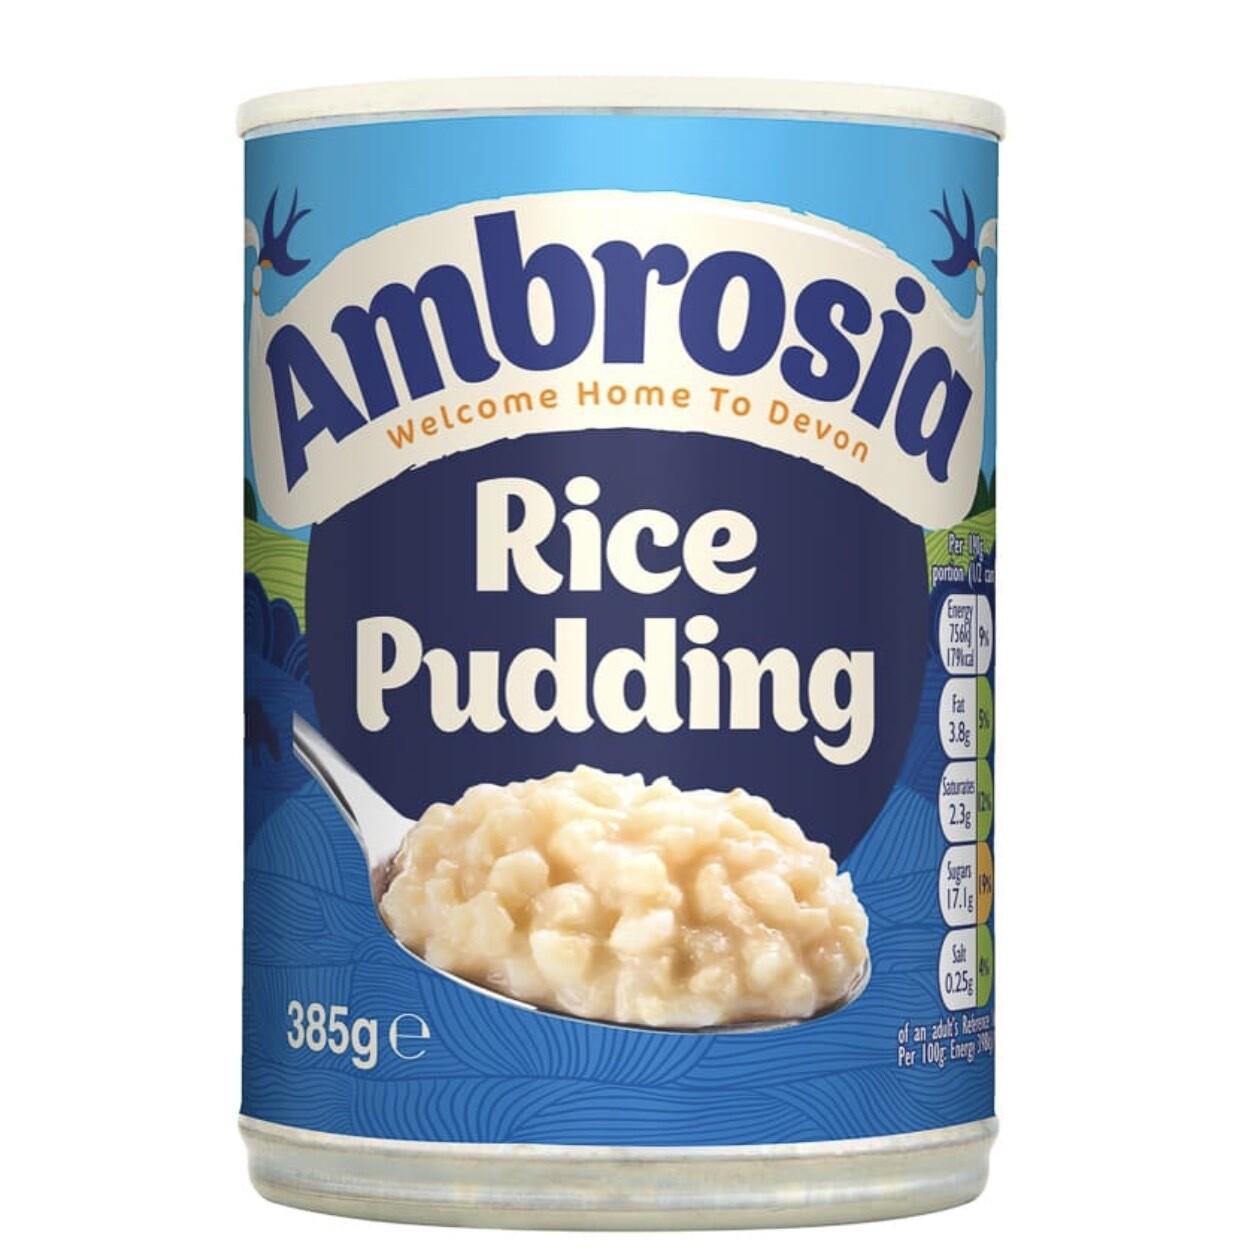 Ambrosia Rice Pudding 385g